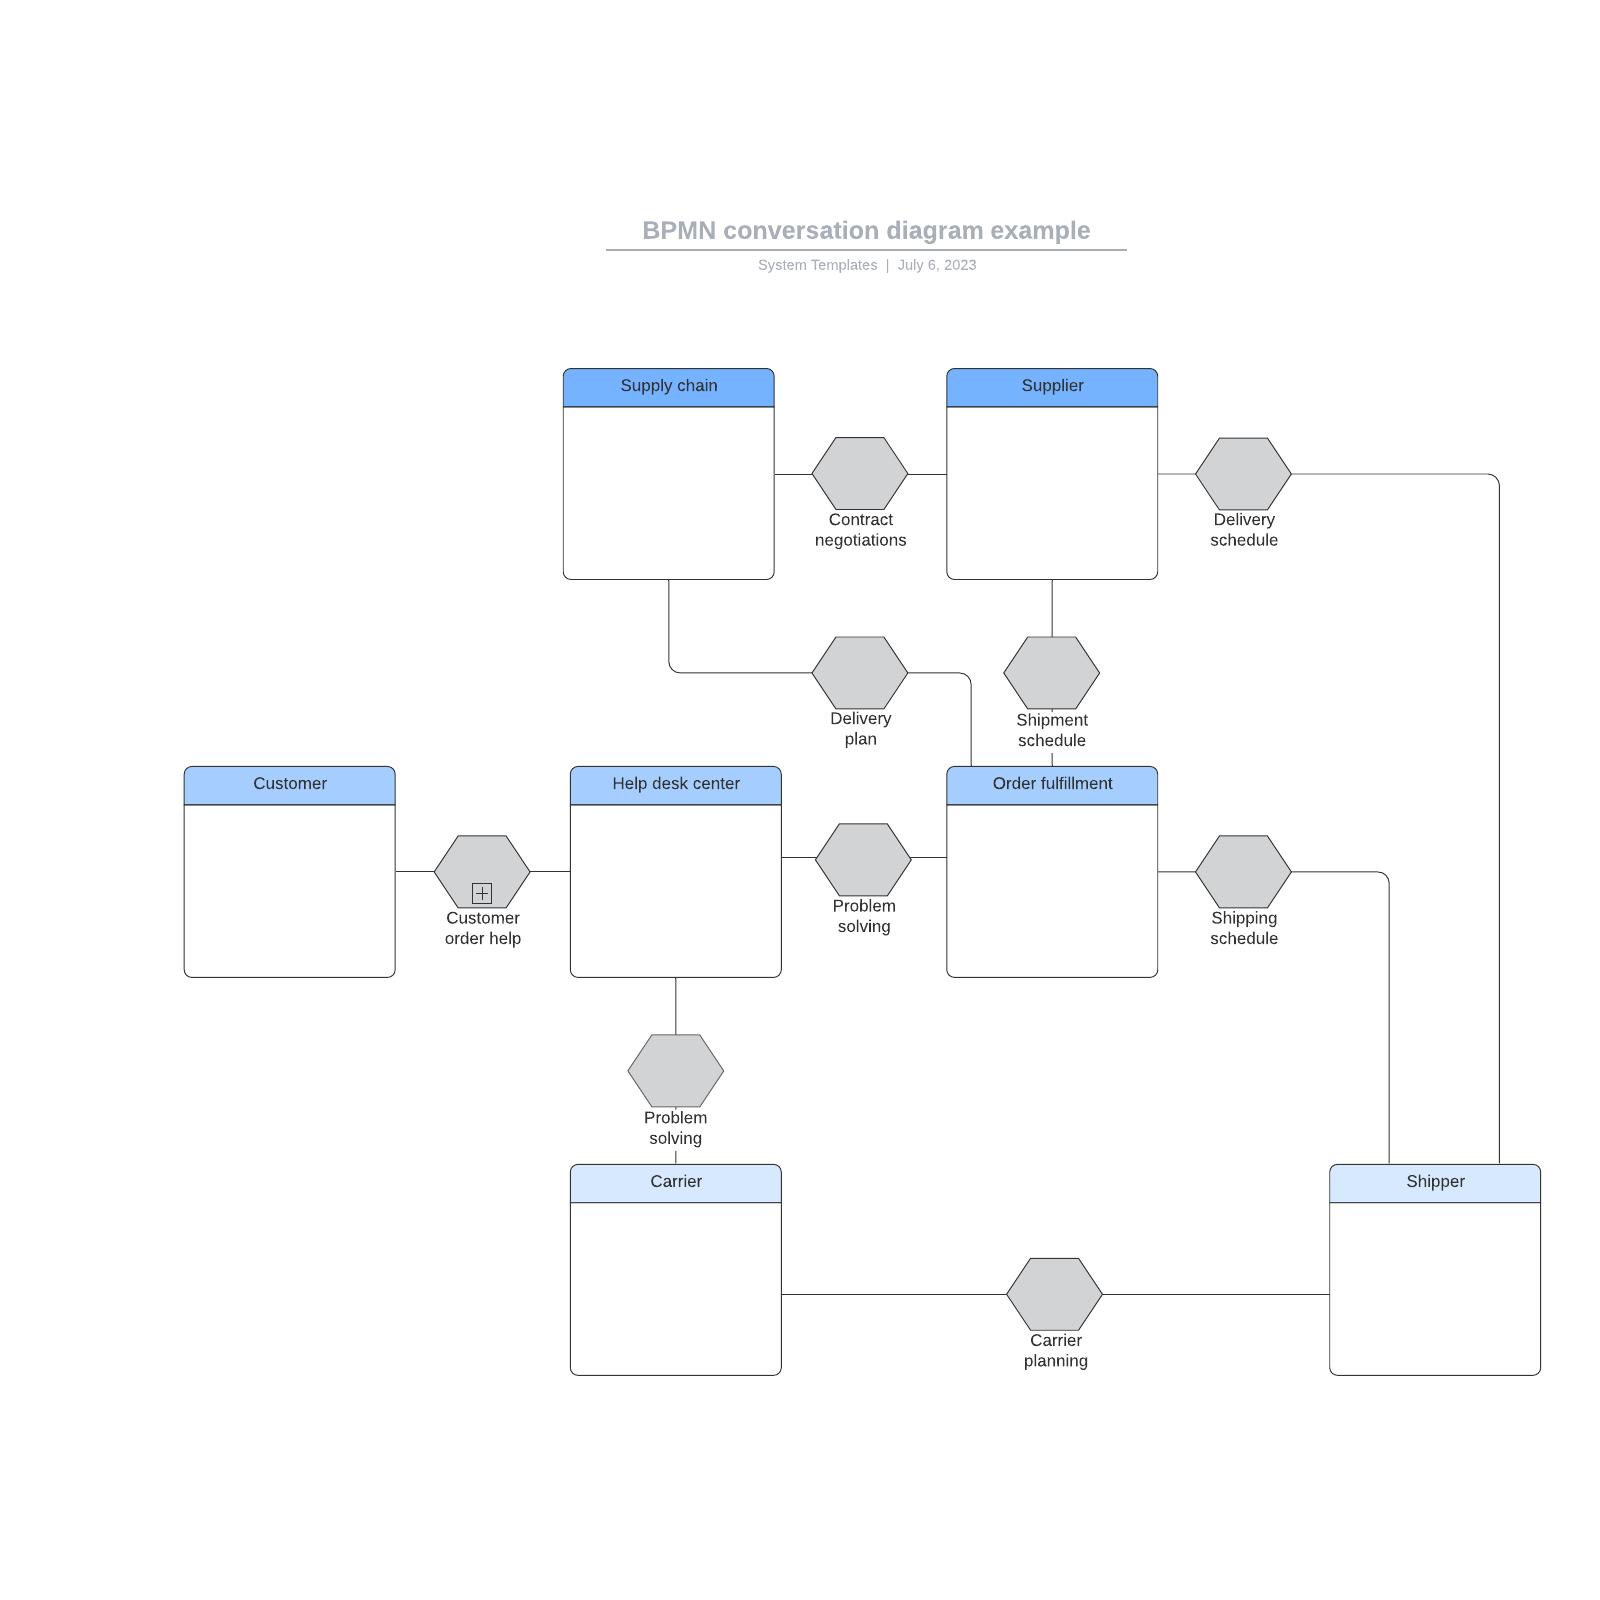 BPMN conversation diagram example